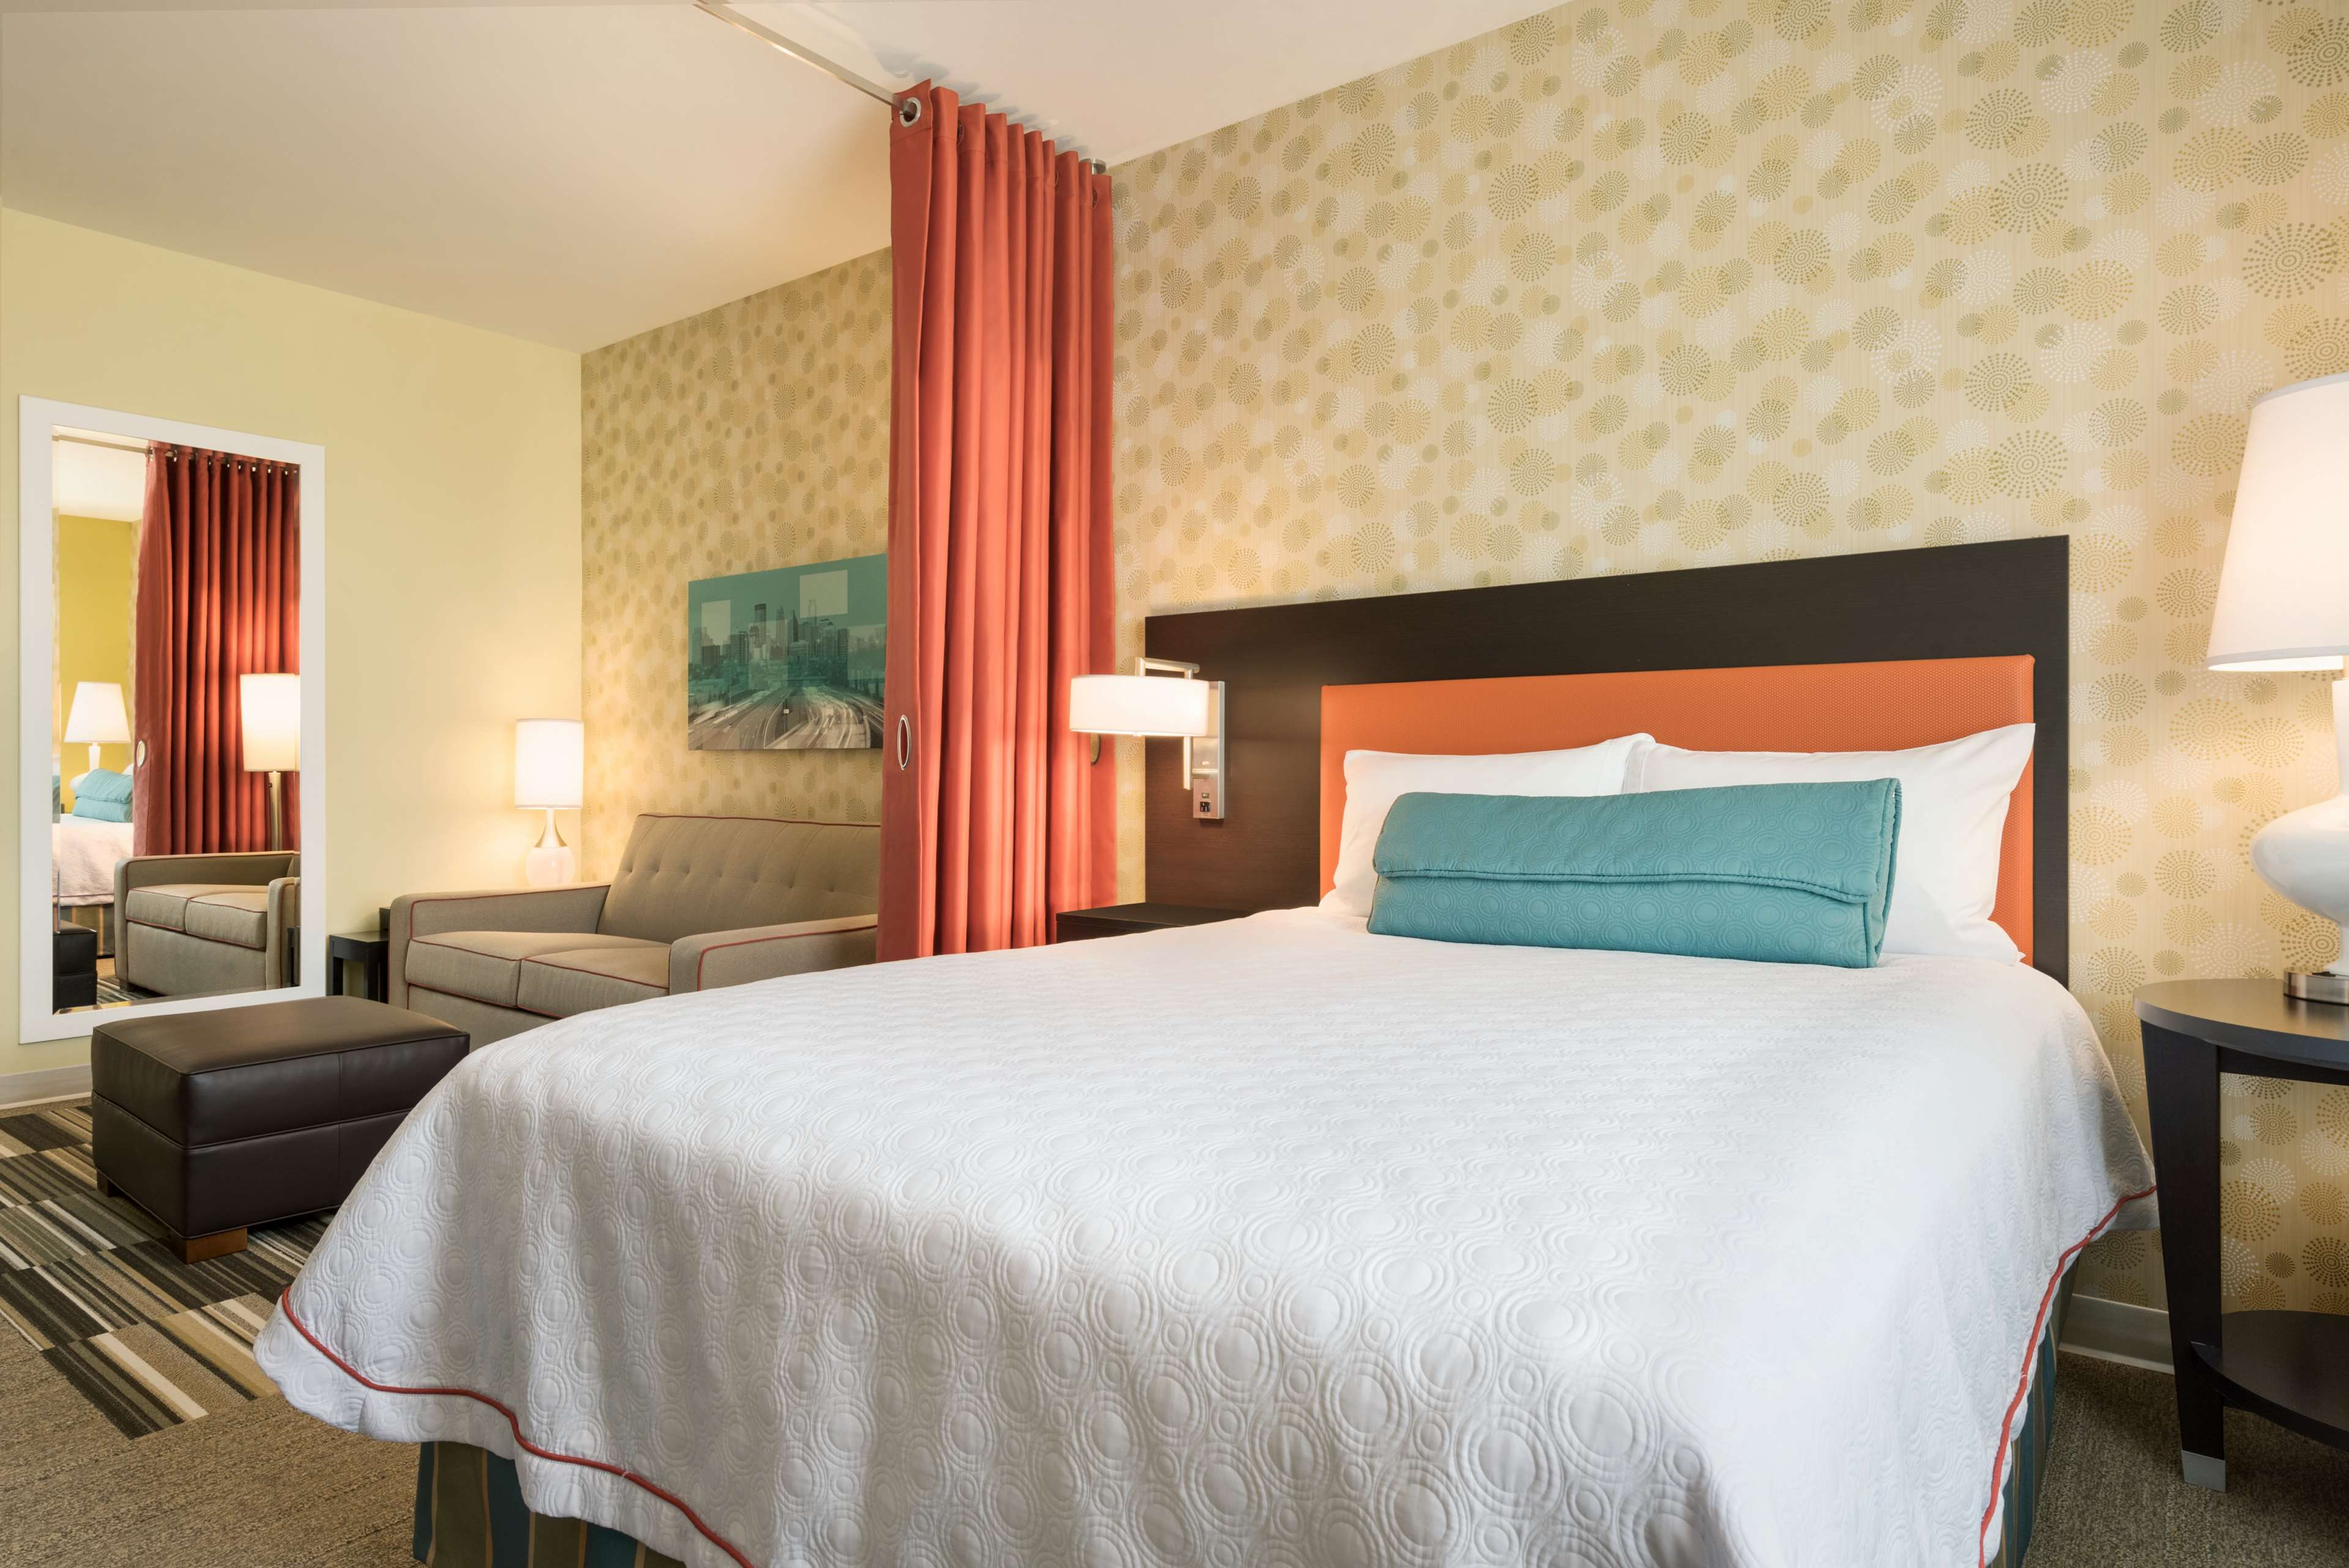 Home2 Suites by Hilton Roseville Minneapolis image 3